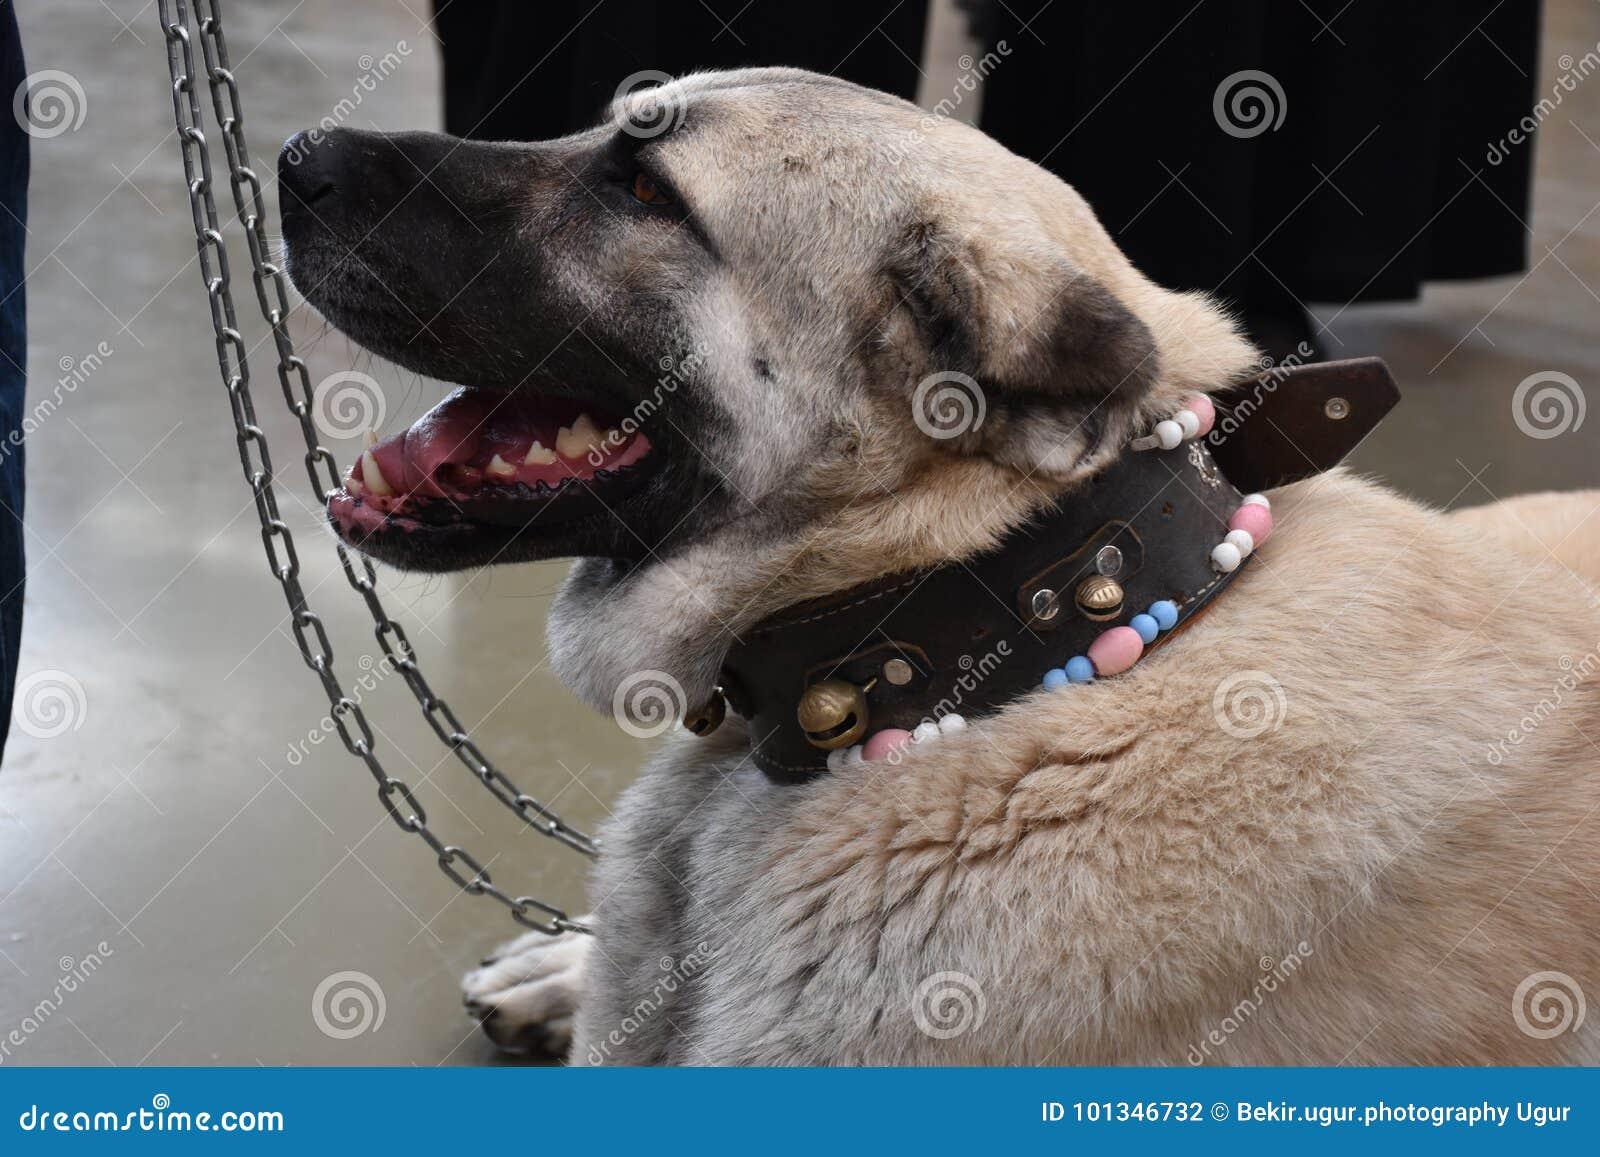 The Sivas Kangal Dog Anatolian Shepherd Dog Turkey